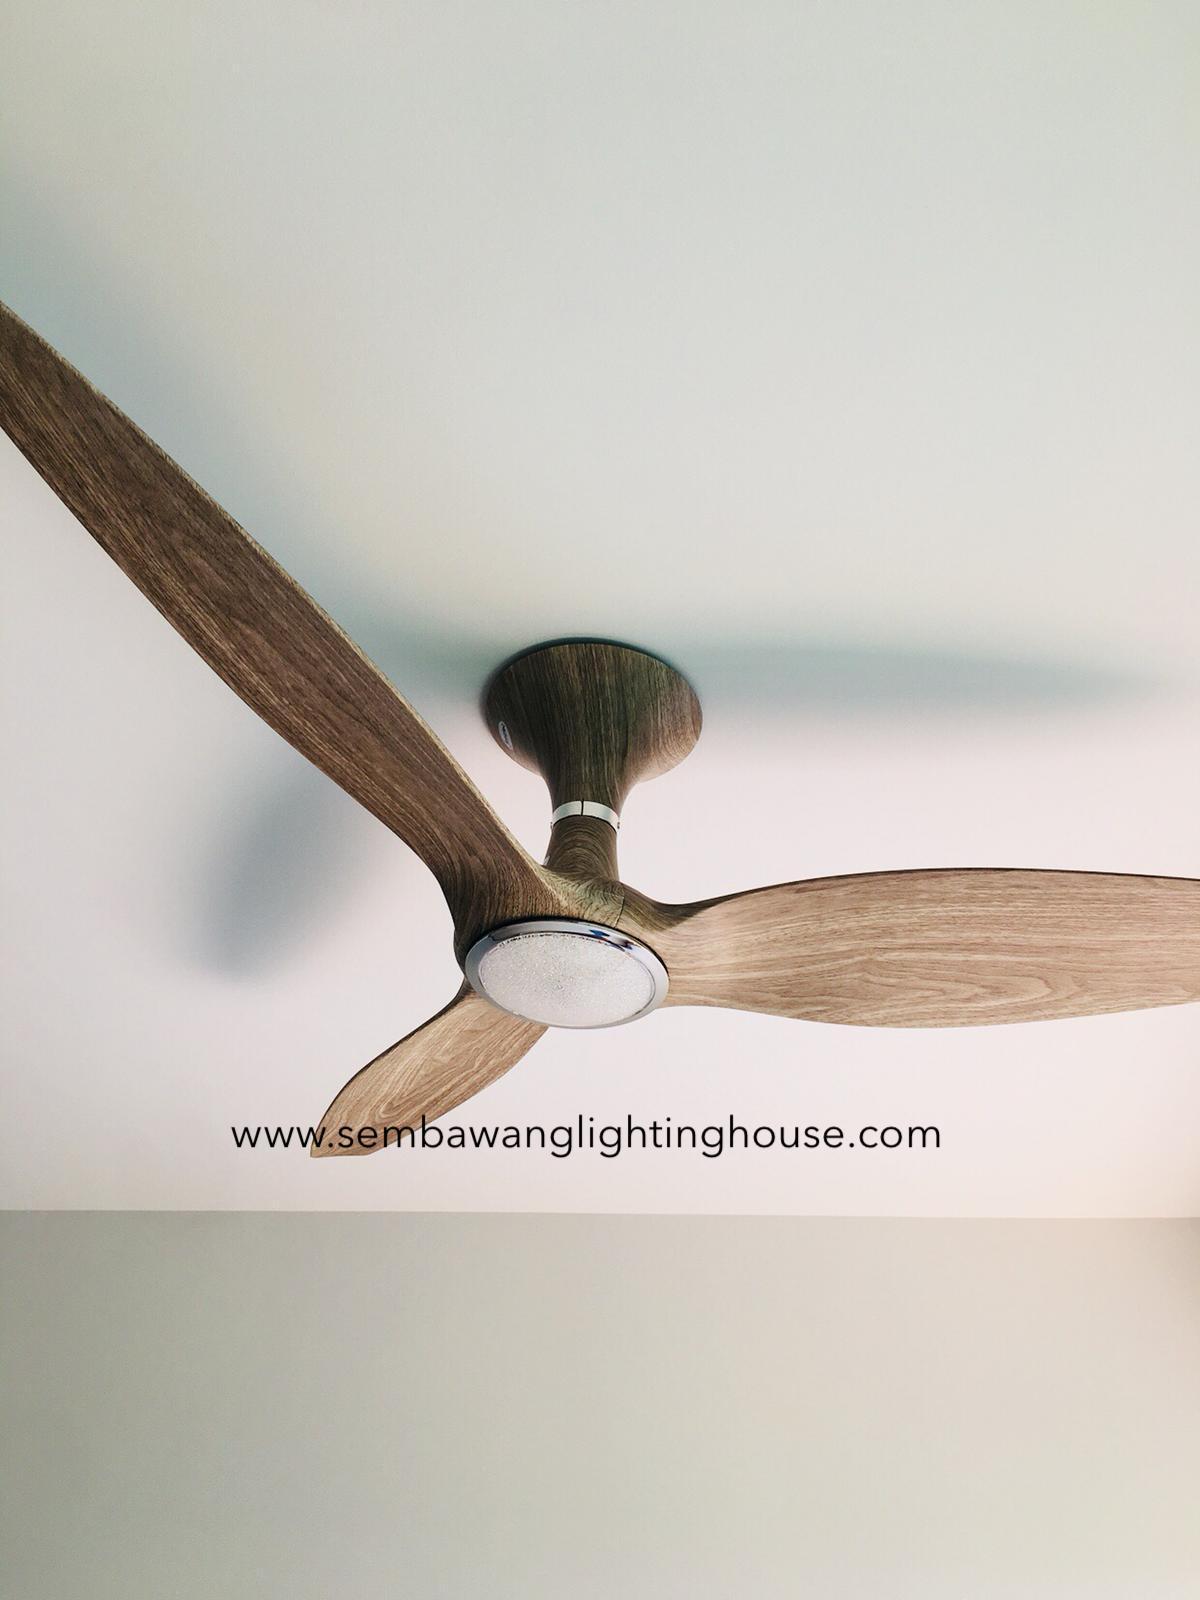 sample02-fanztec-breeze-dc-led-ceiling-fan-sembawang-lighting-house.jpeg